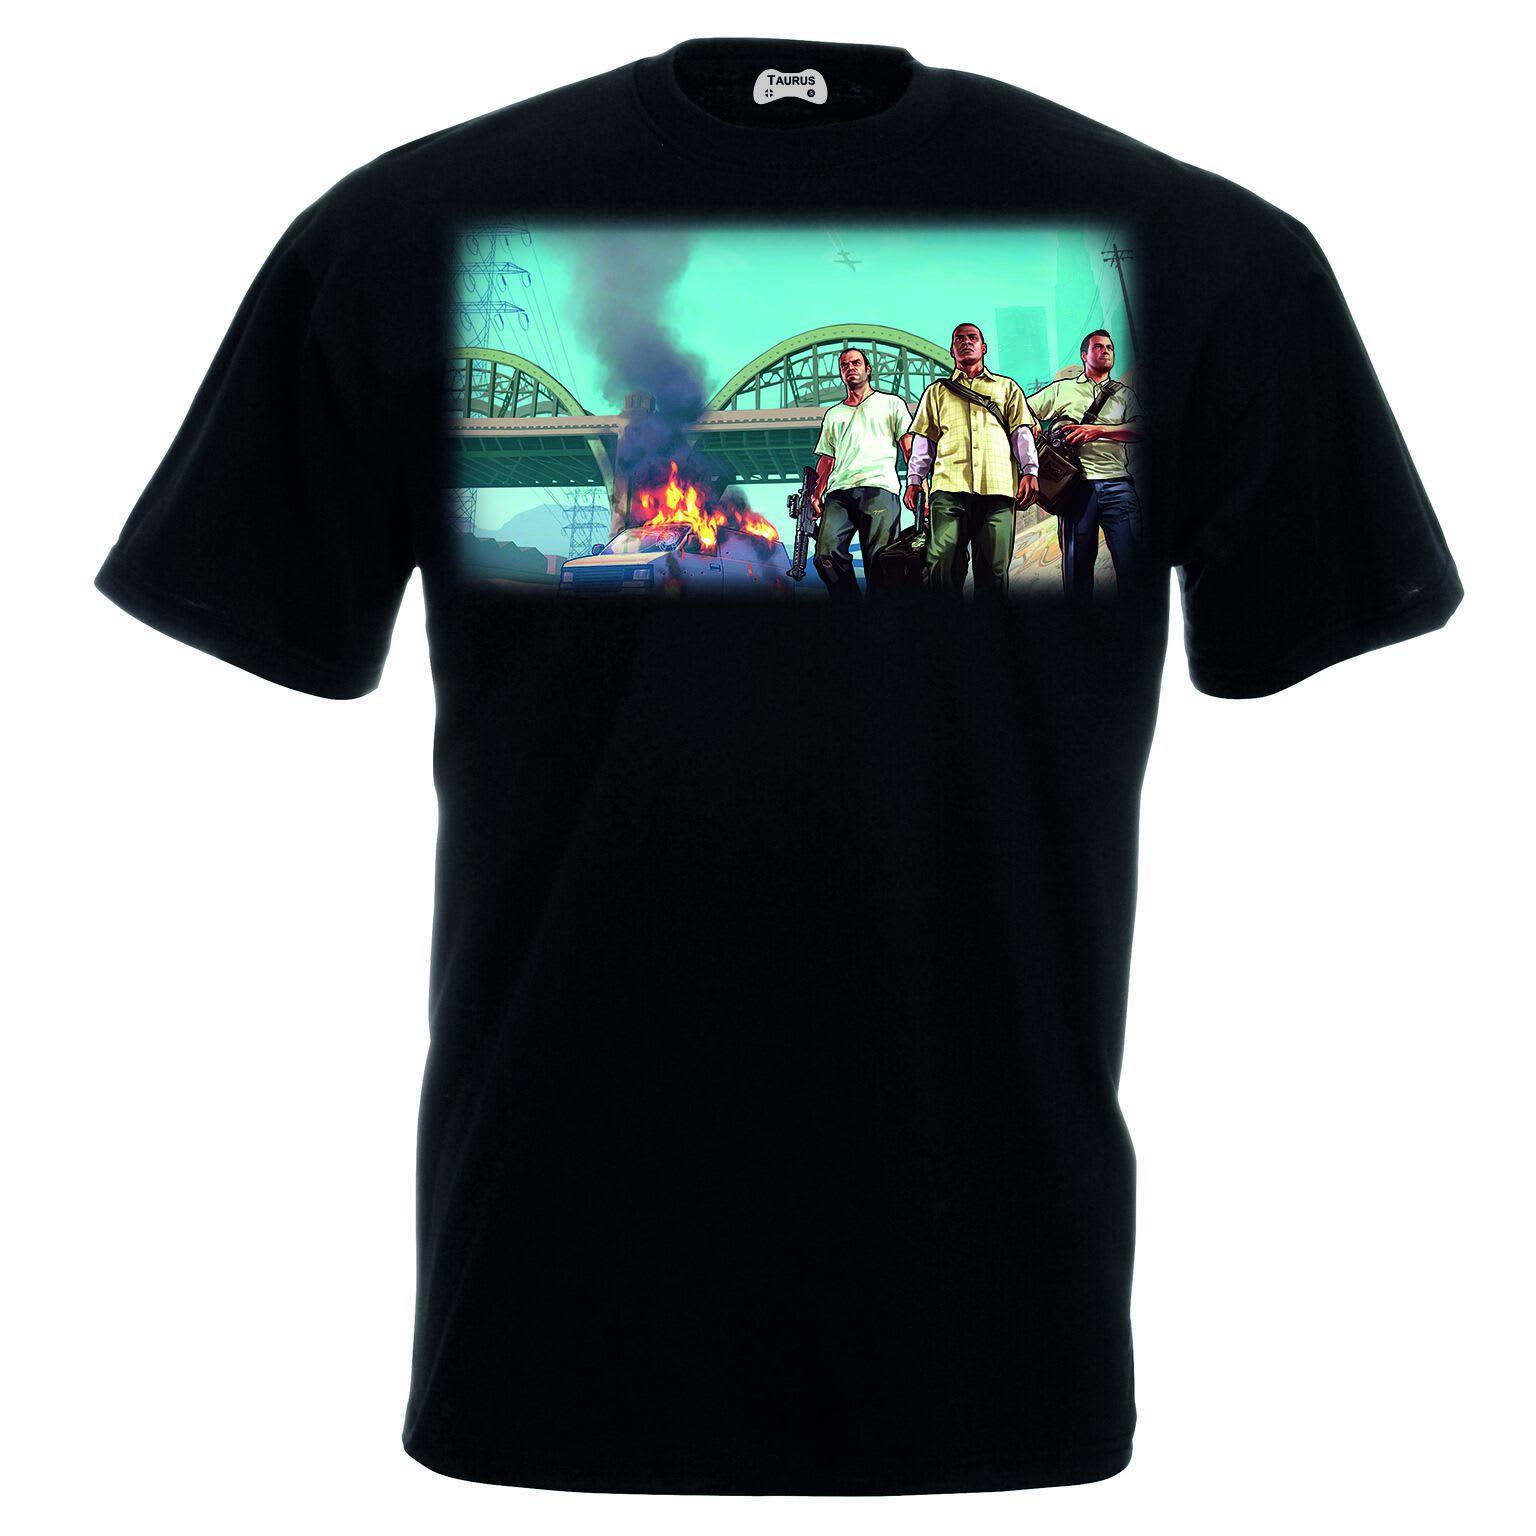 Grand Theft Auto V T-Shirt All Three